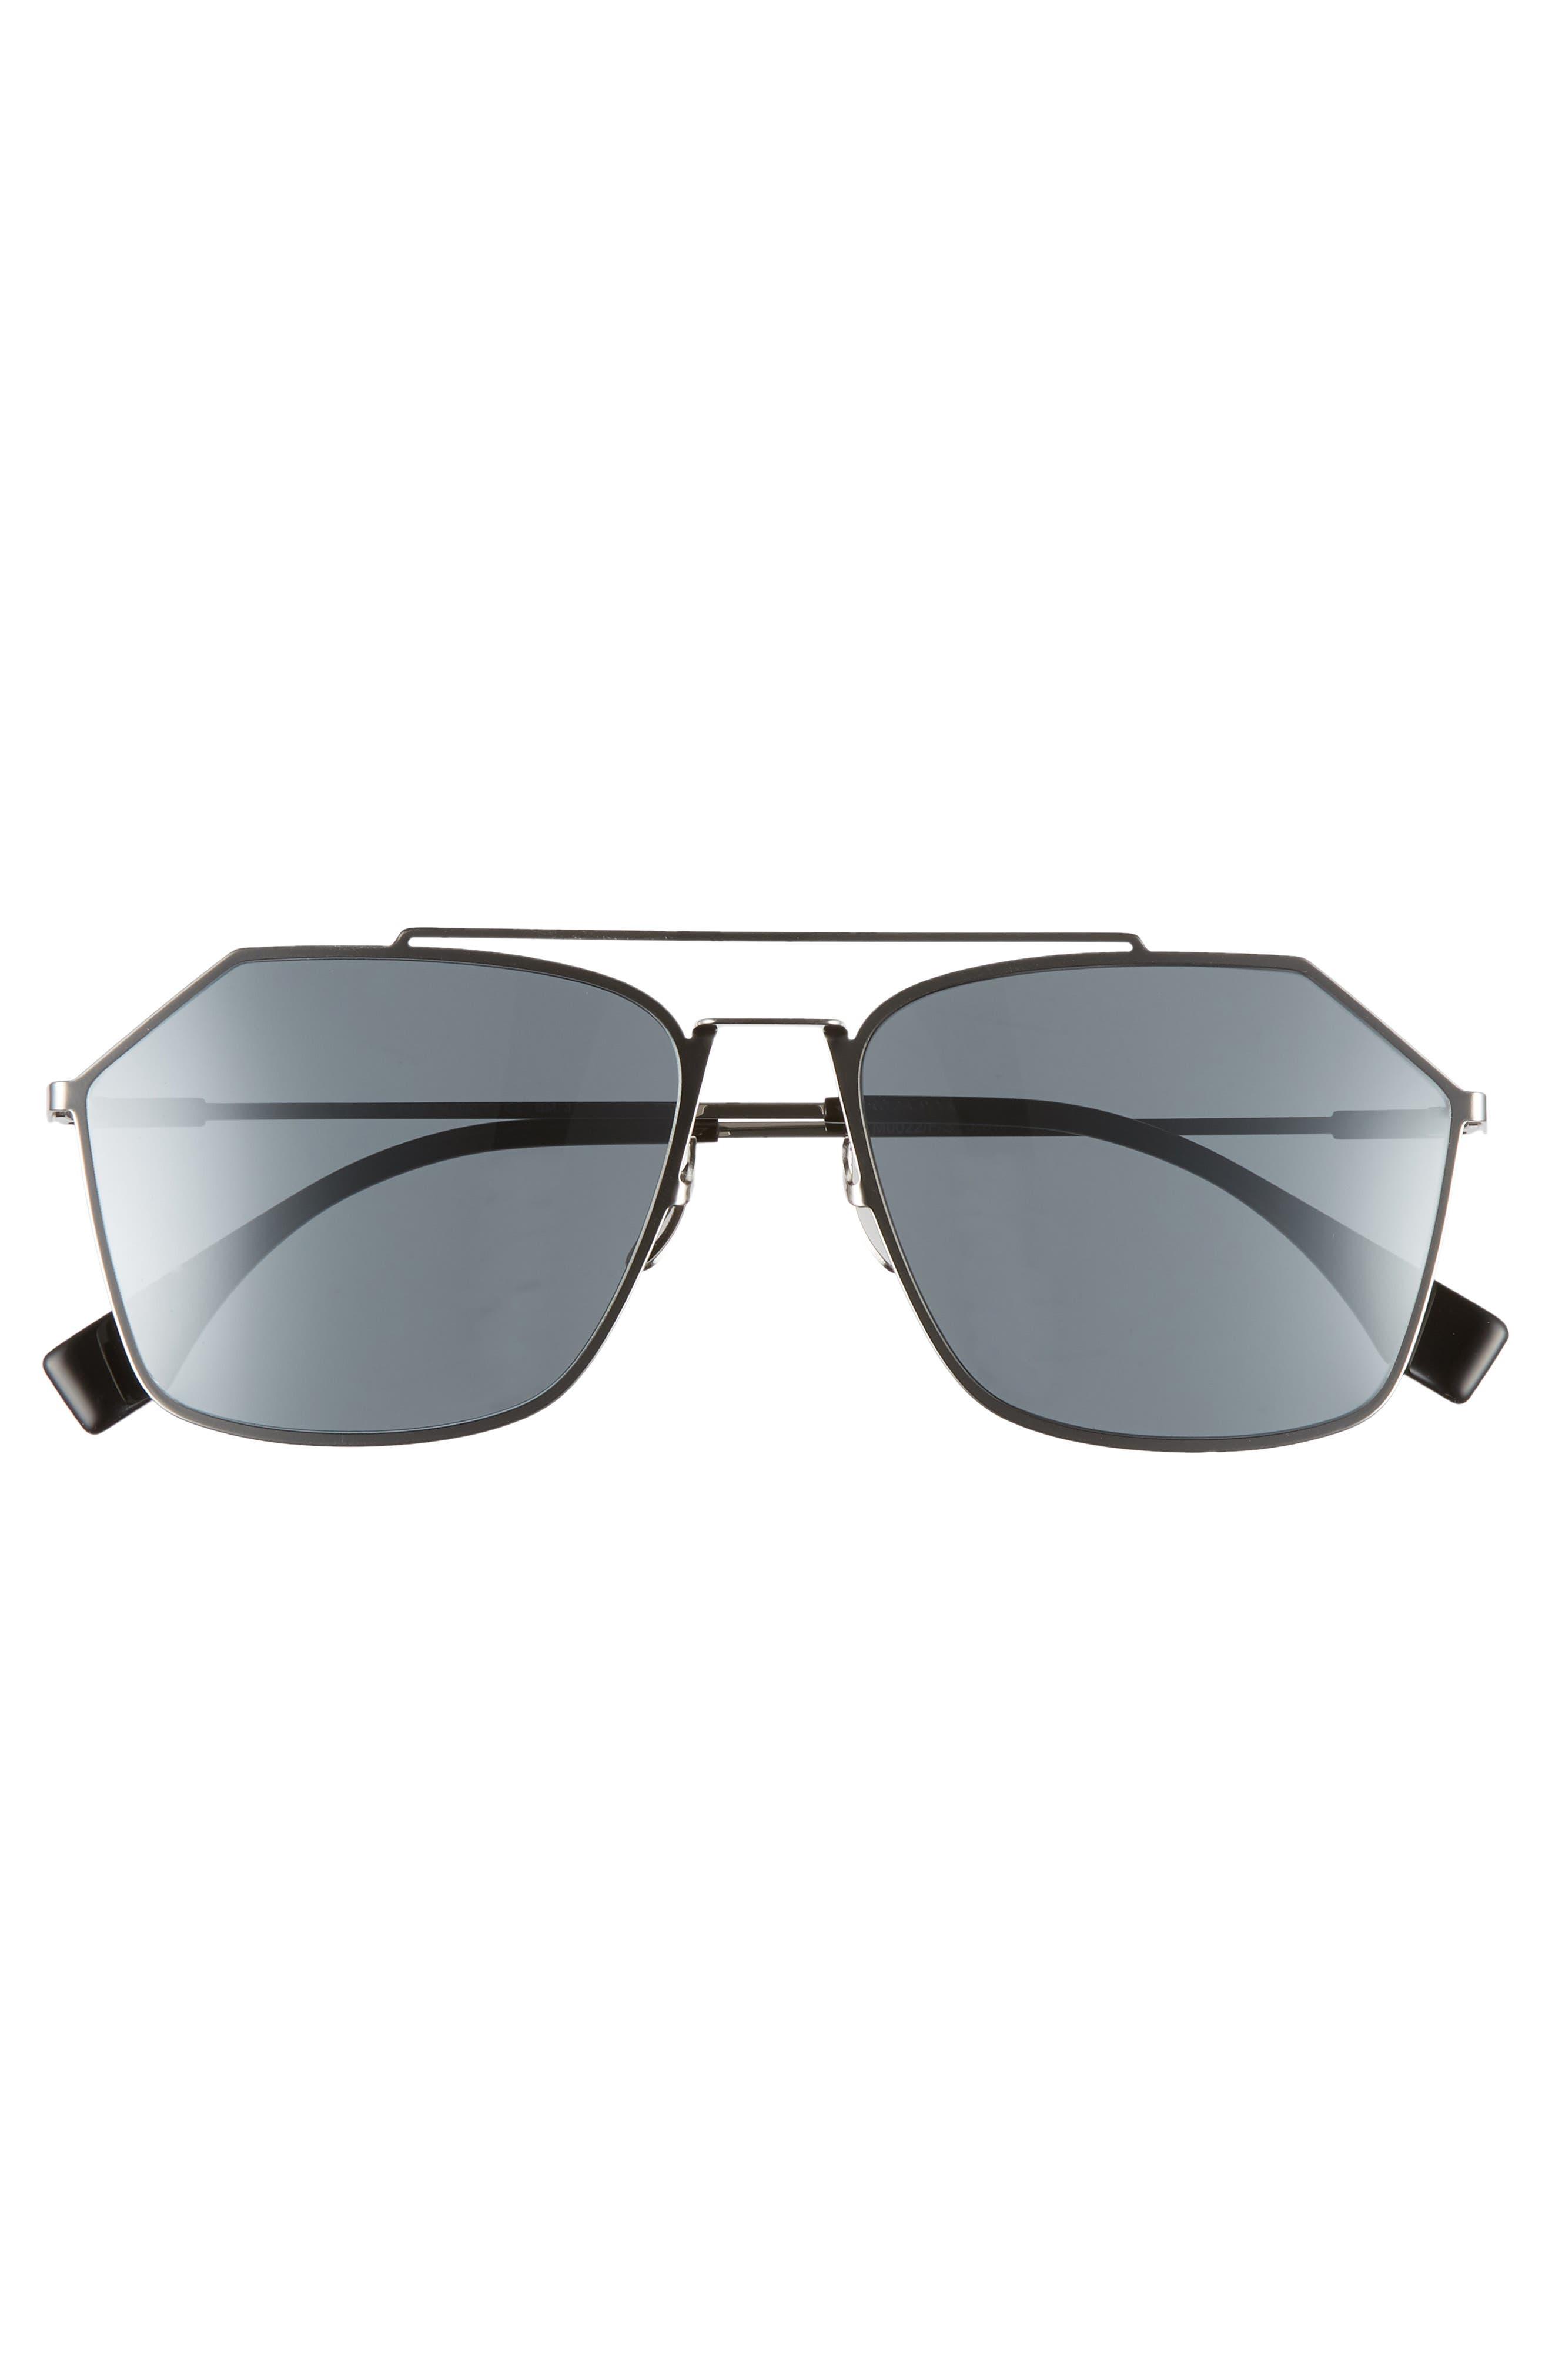 59mm Navigator Sunglasses,                             Alternate thumbnail 3, color,                             RUTHENIUM